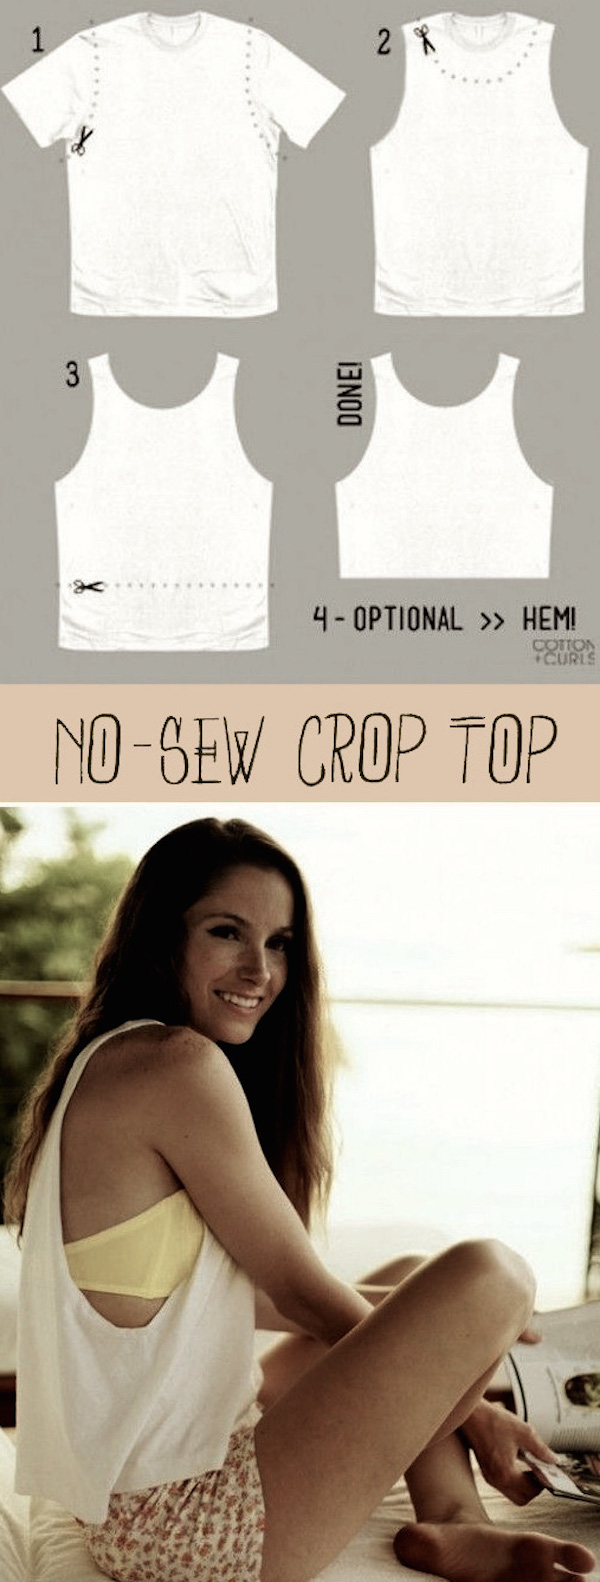 crop-top-diy-malorie-anne copy